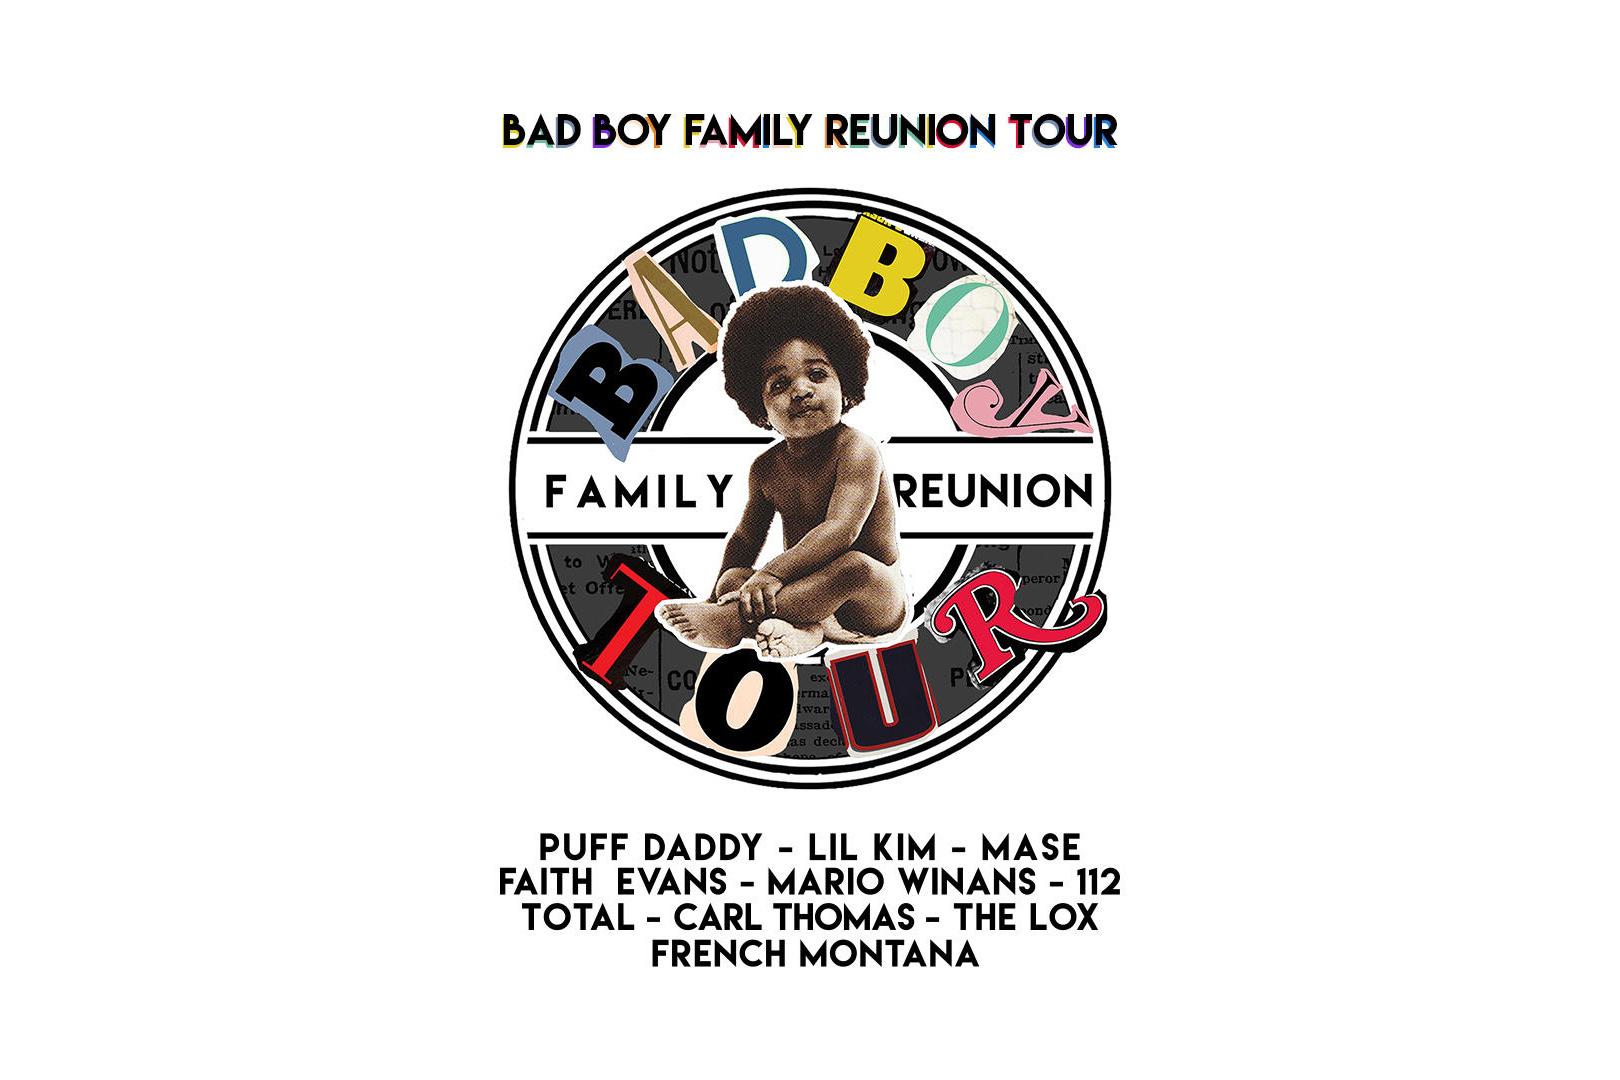 puff-daddy-bad-boy-family-reunion-tour-1